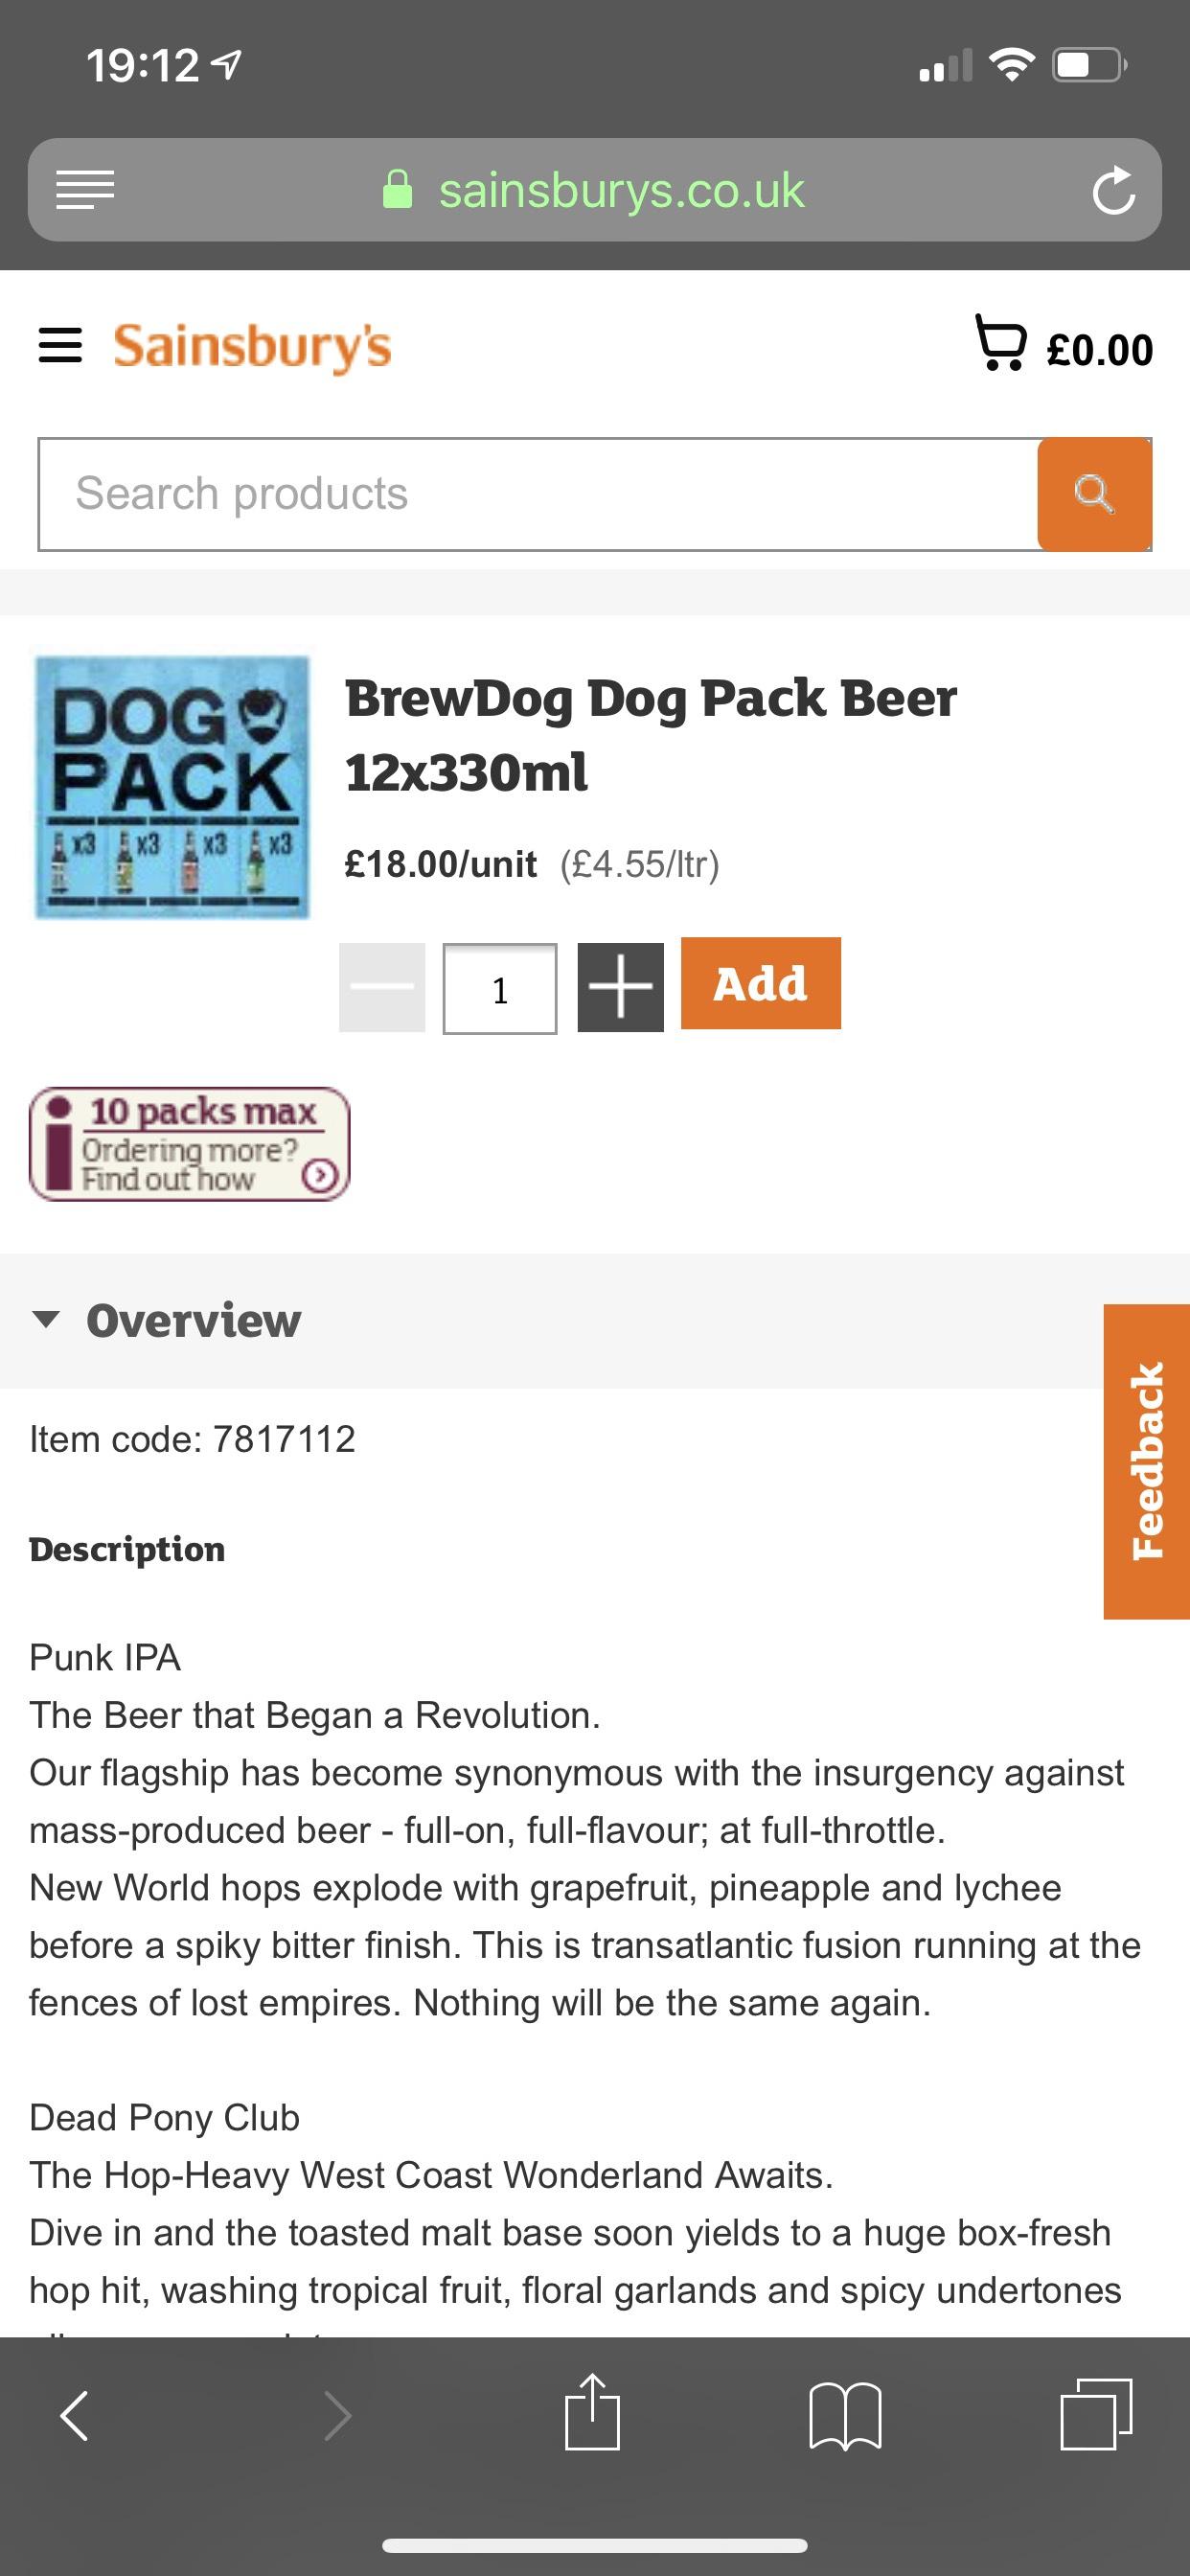 Brewdog Dog Pack 12 bottles £18 instore @ Sainsbury's